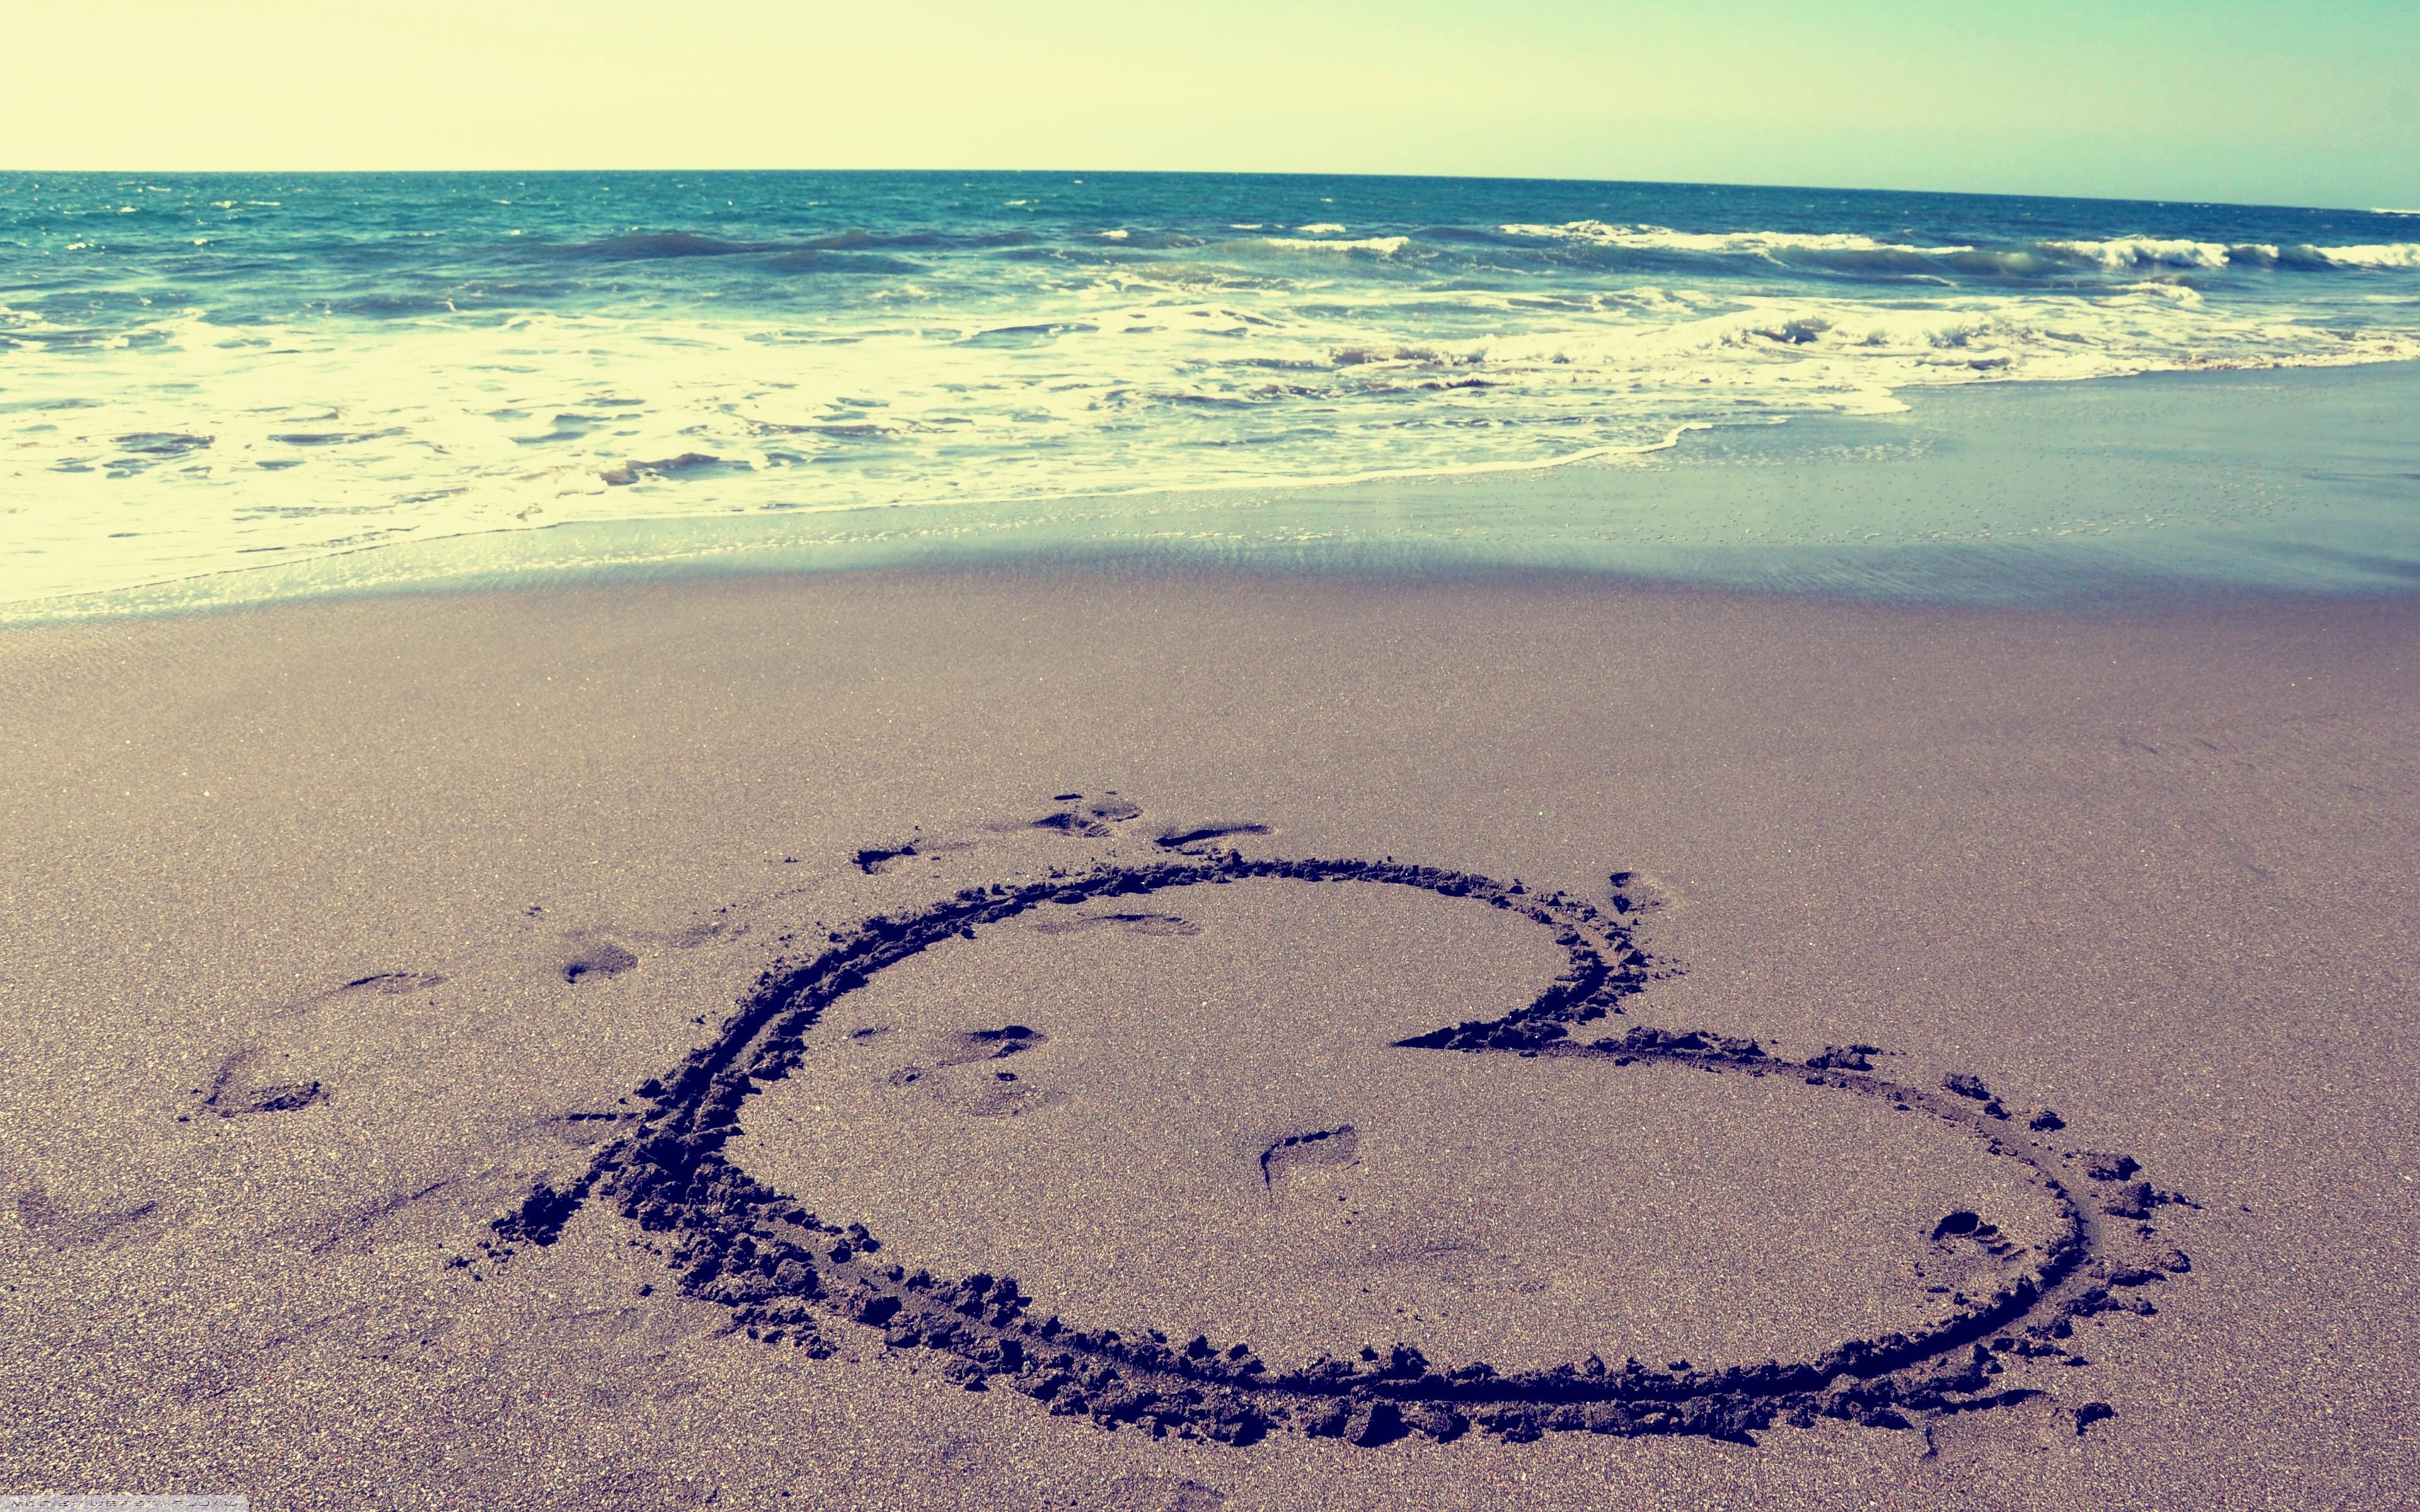 красивые картинки океан любви таком веселом розовом